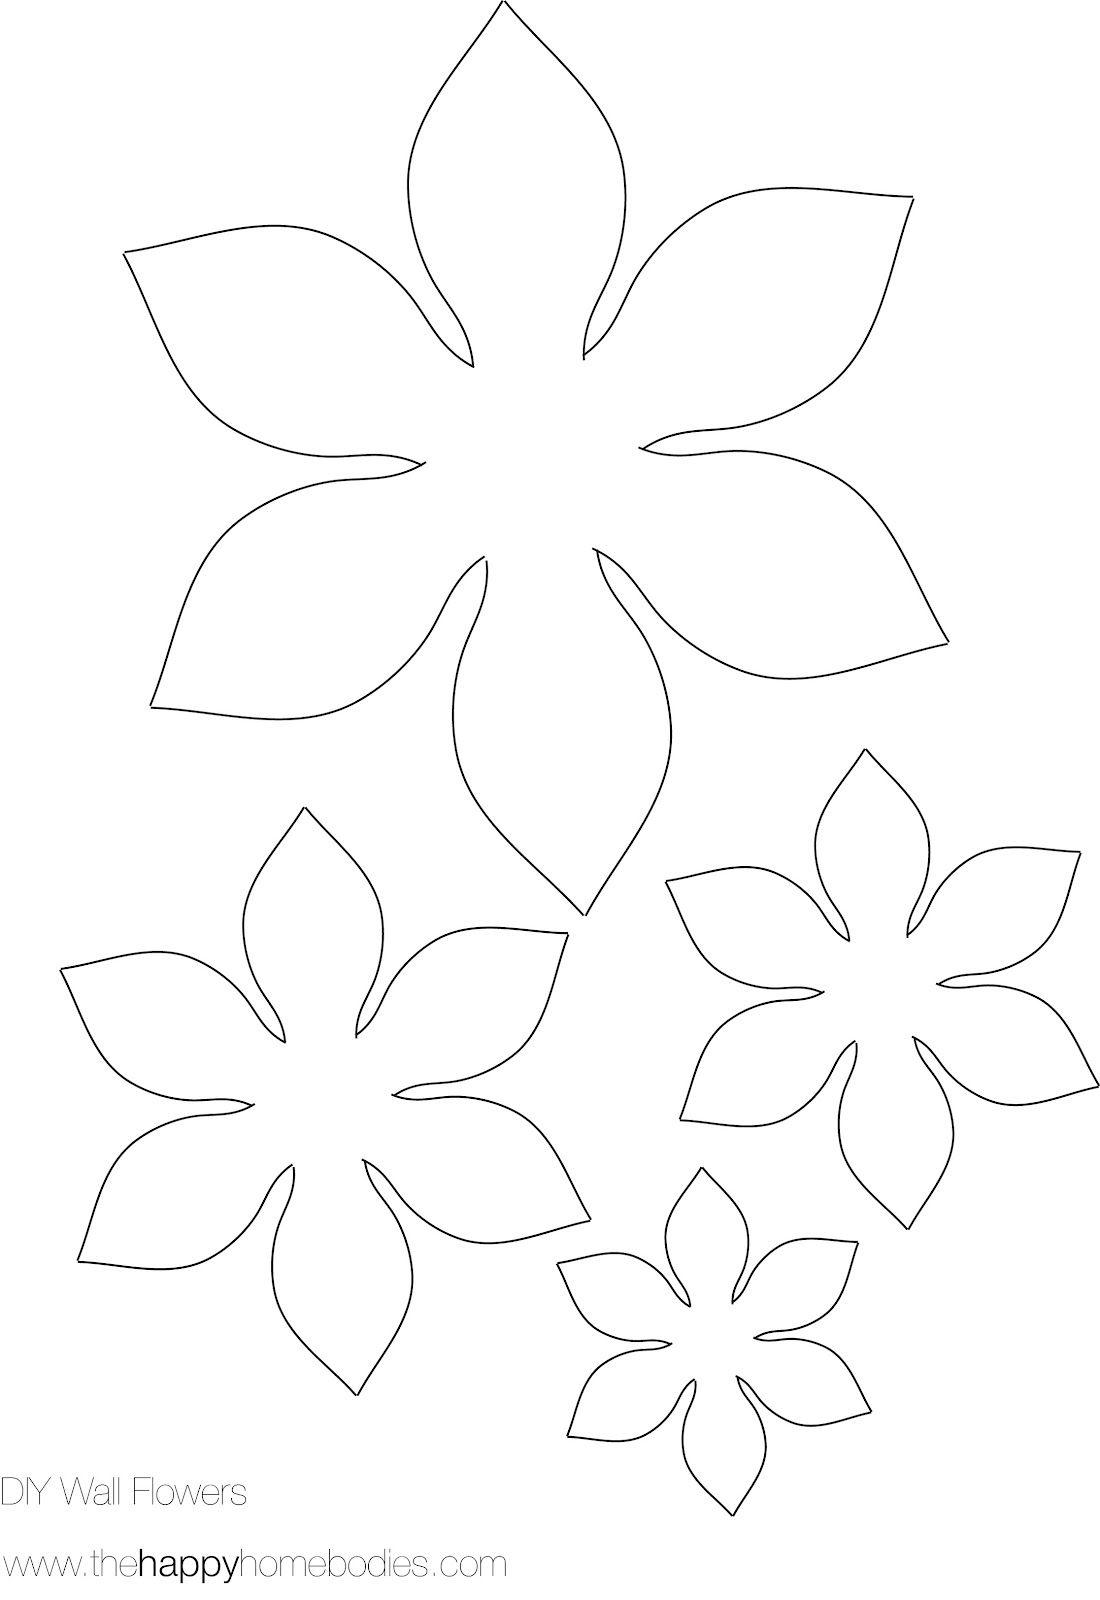 Paper Flower Cut Out Templates